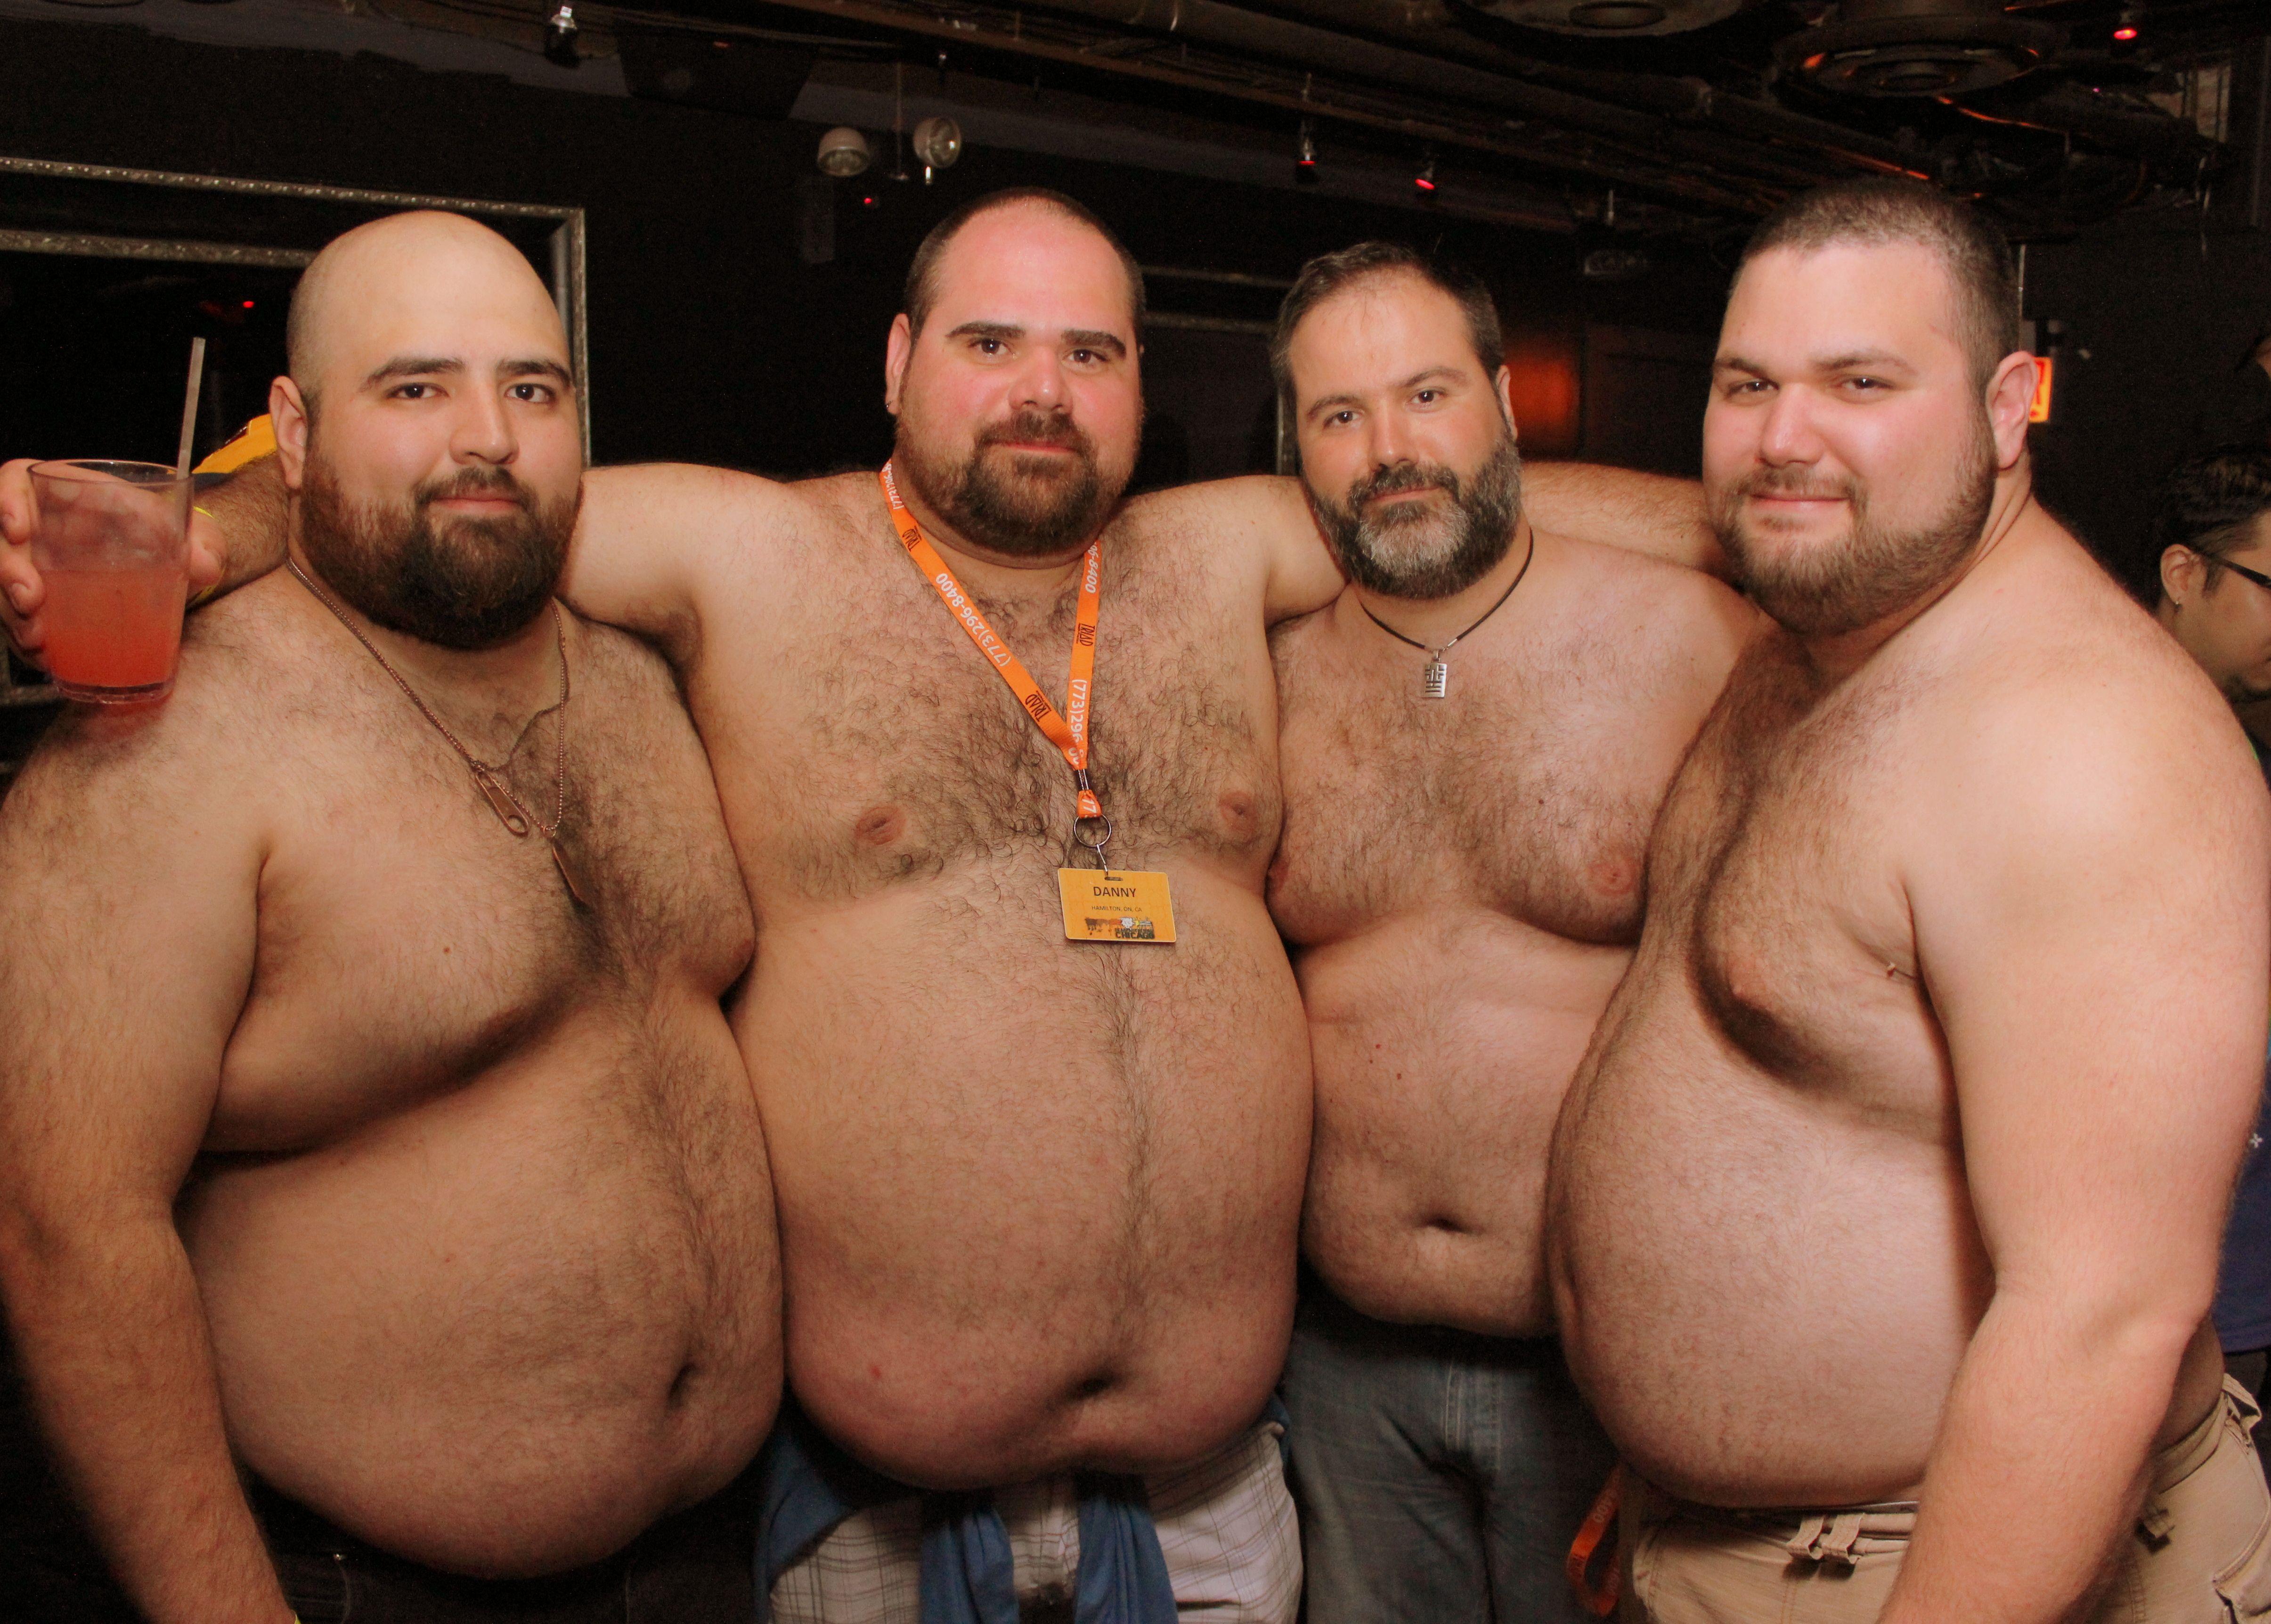 Fat gay chubby bear men